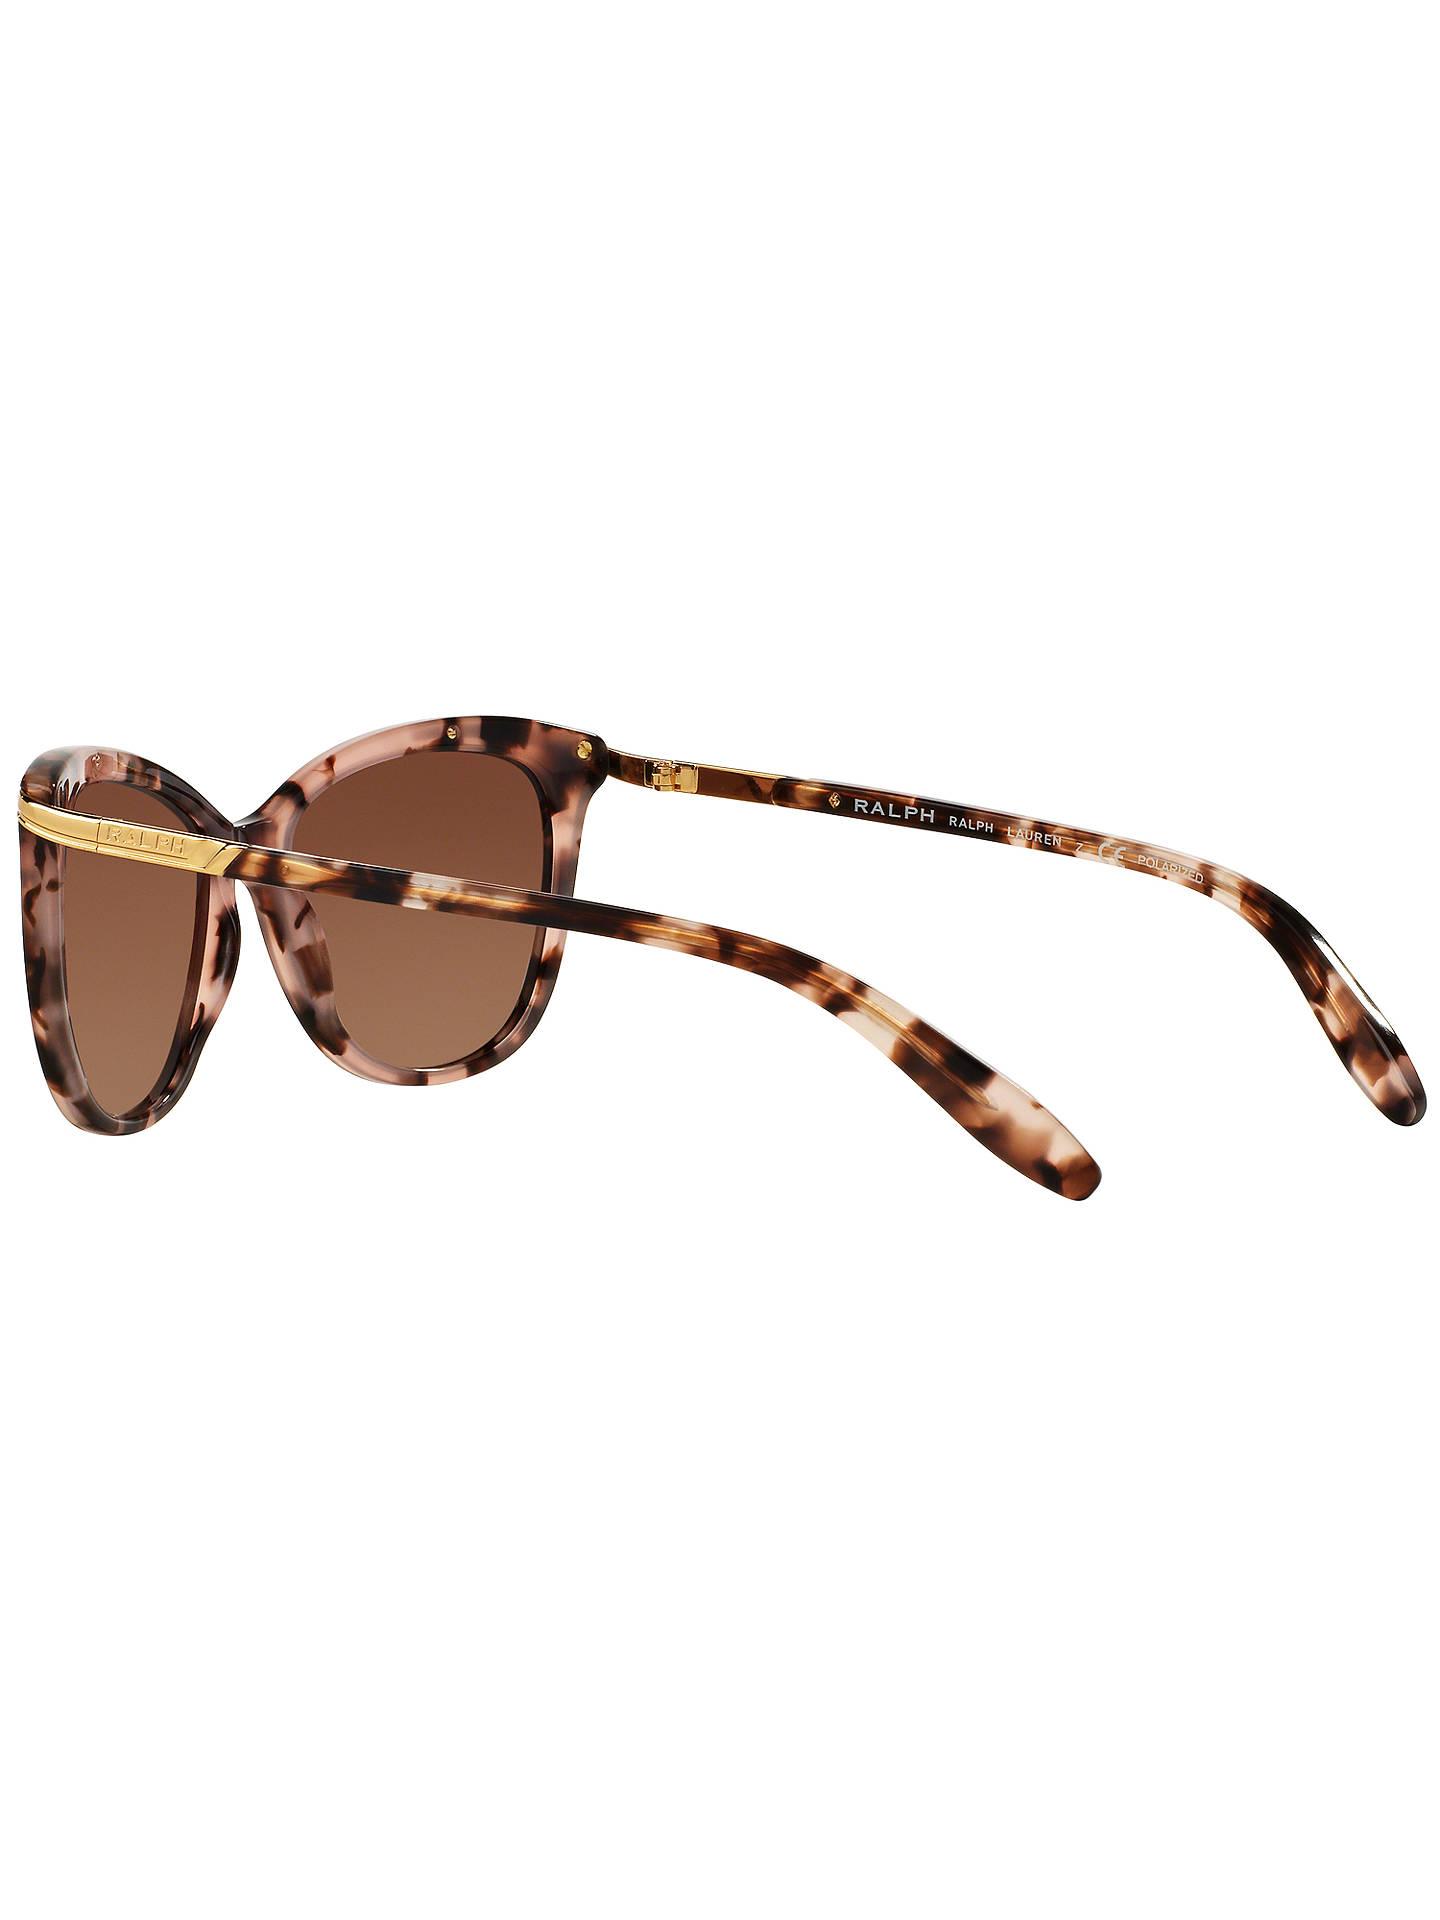 d4d4cdef48 Ralph RA5203 Polarised Cat s Eye Sunglasses at John Lewis   Partners